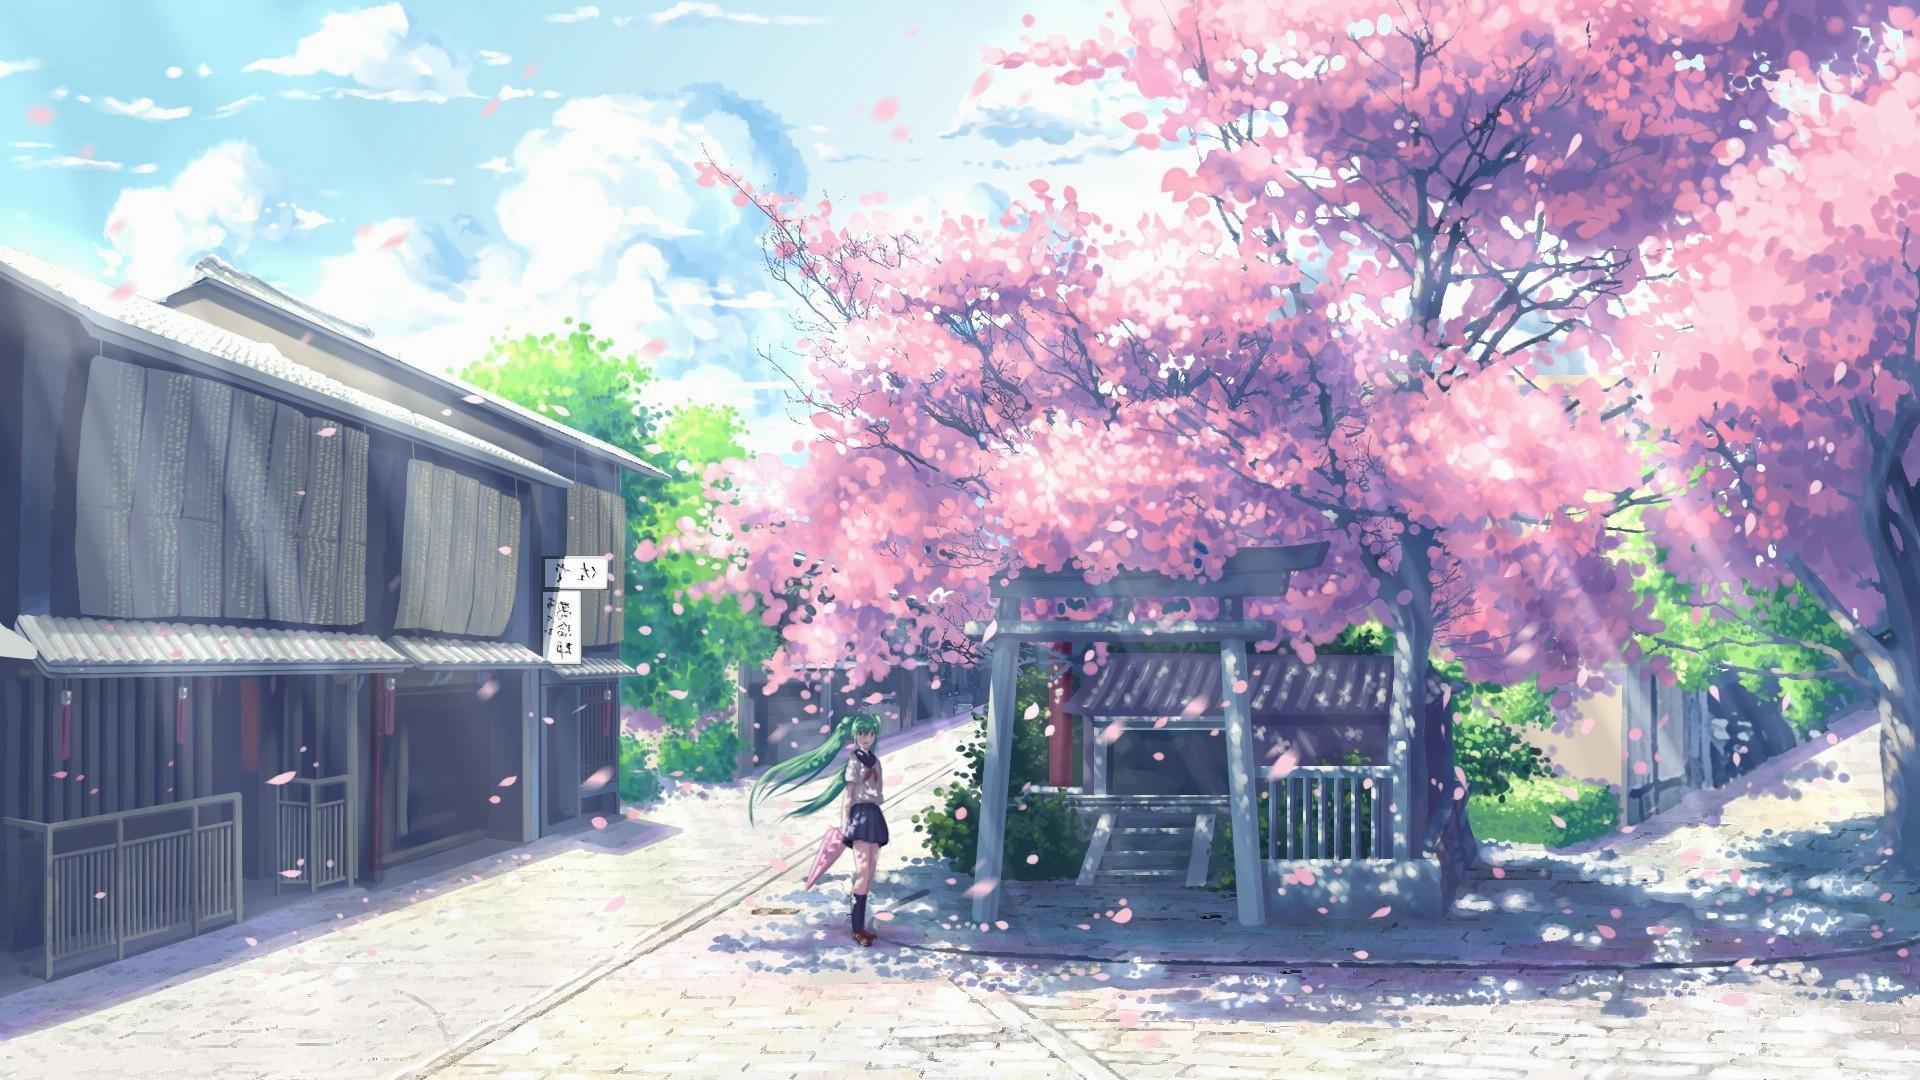 wallpaper.wiki-Anime-Cherry-Blossom-Hi-Res-1920×1080-